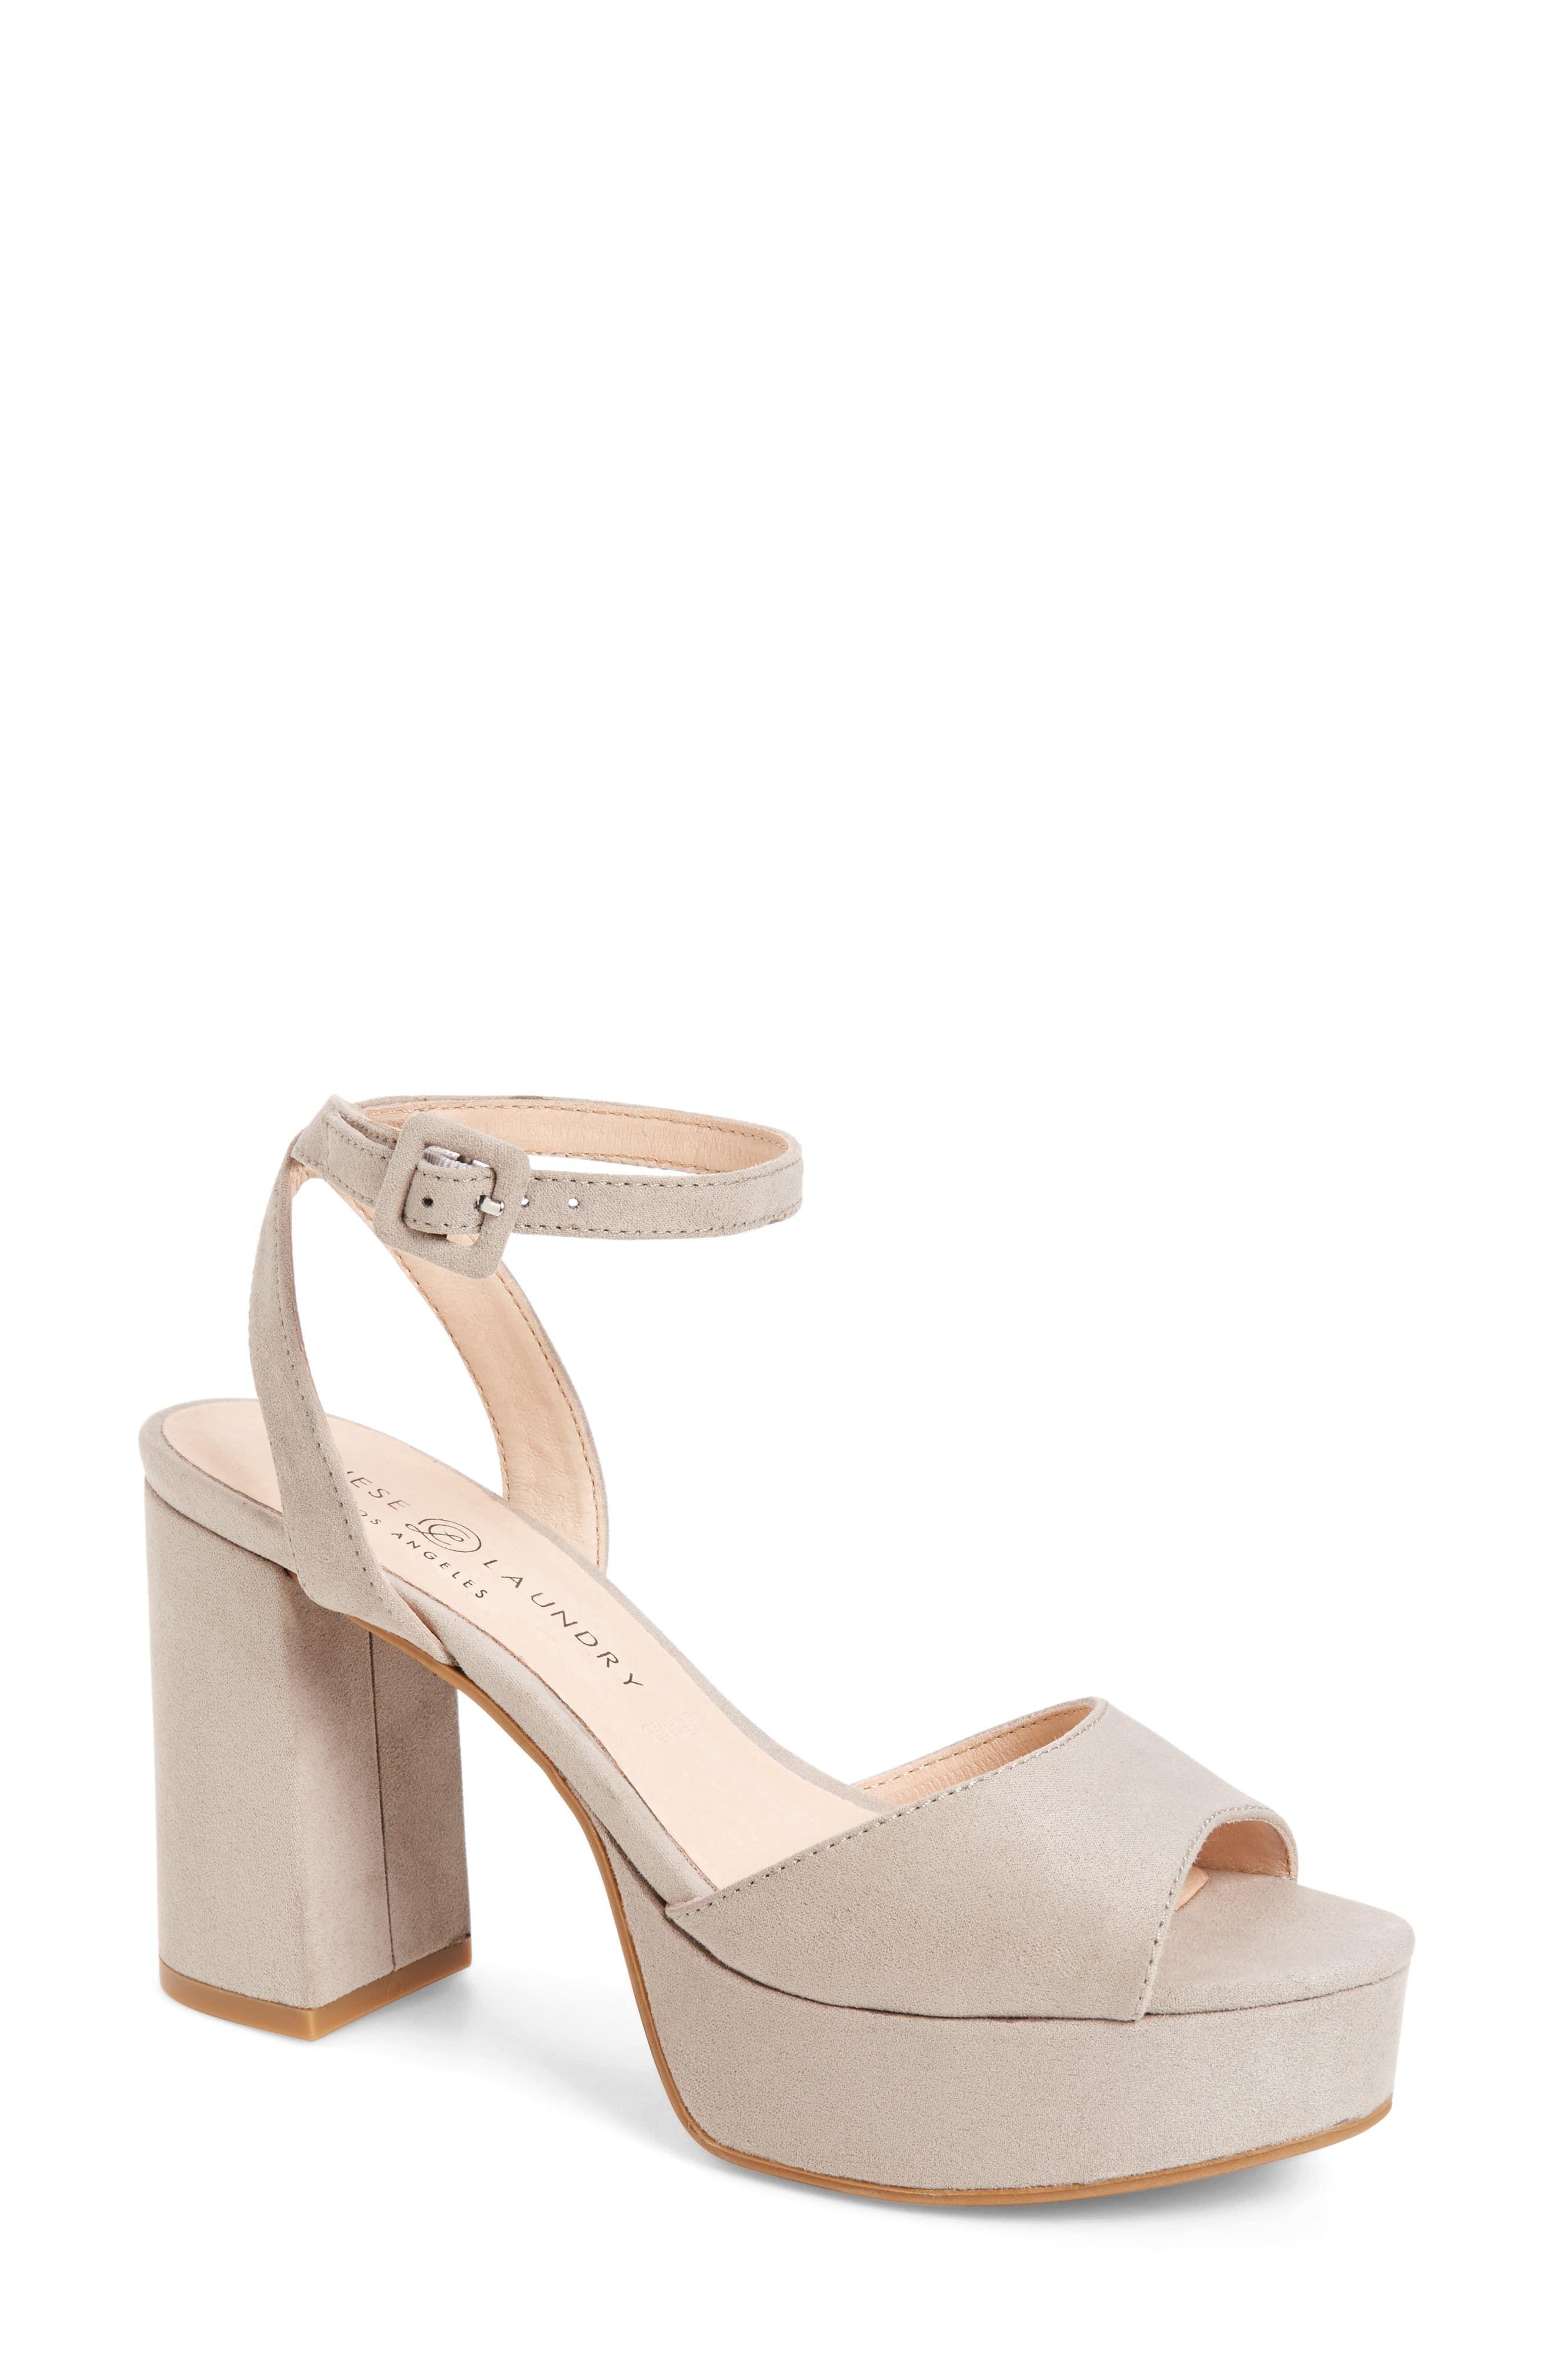 Women S Chinese Laundry Theresa Platform Sandal Size 7 M Grey